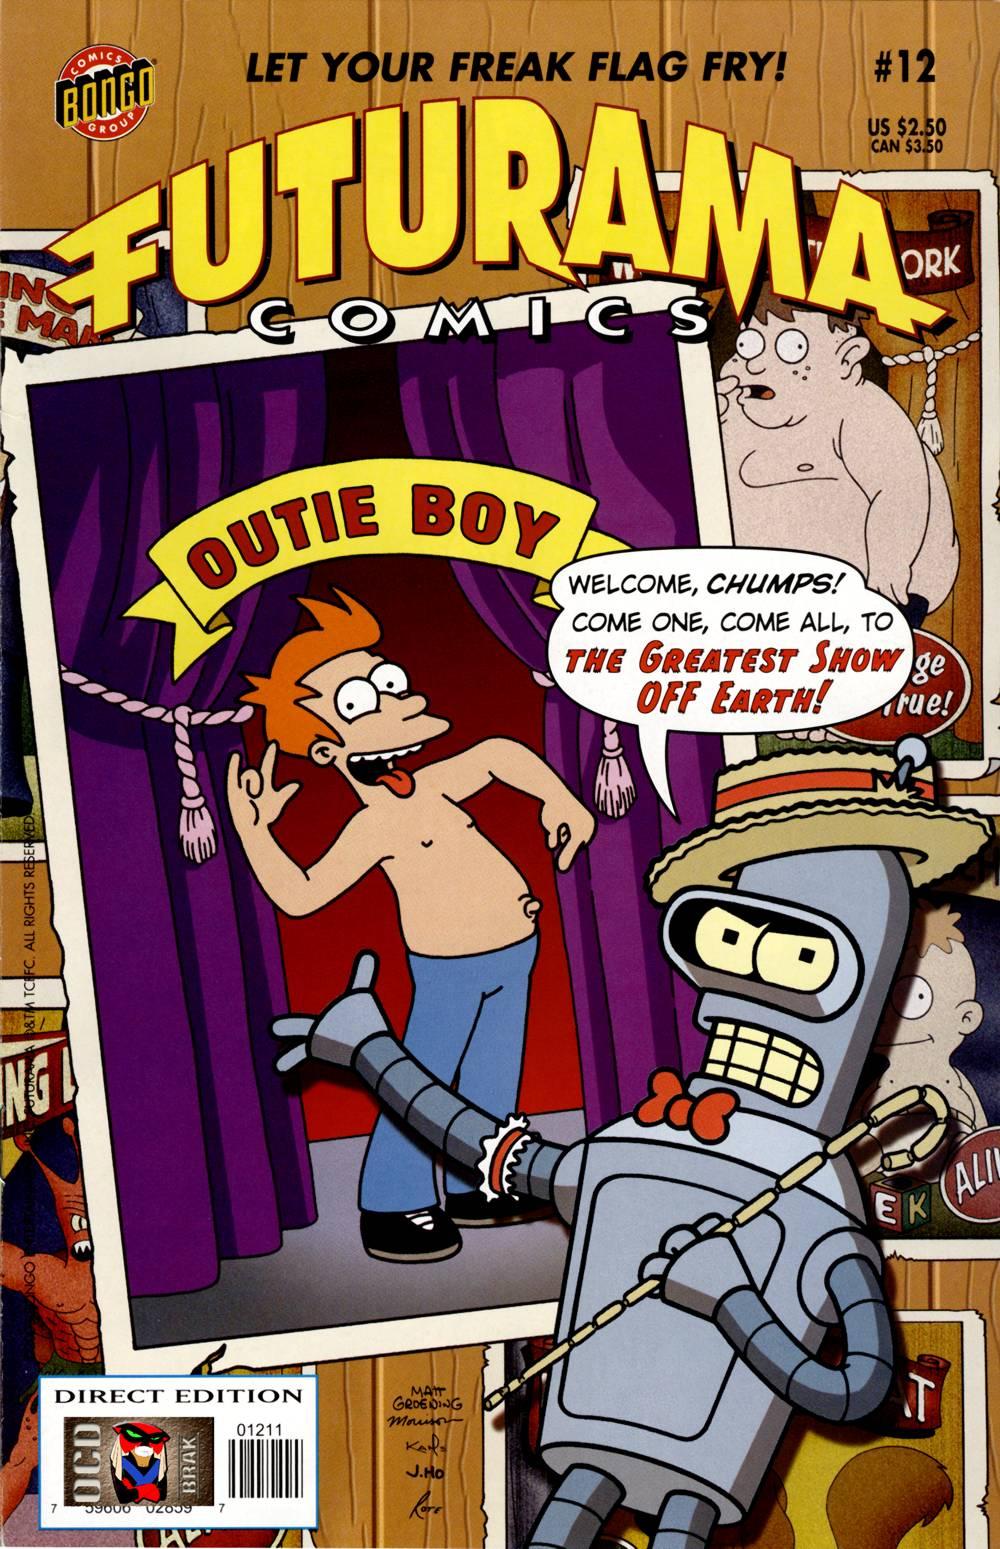 Futurama Comics issue 12 - Page 1